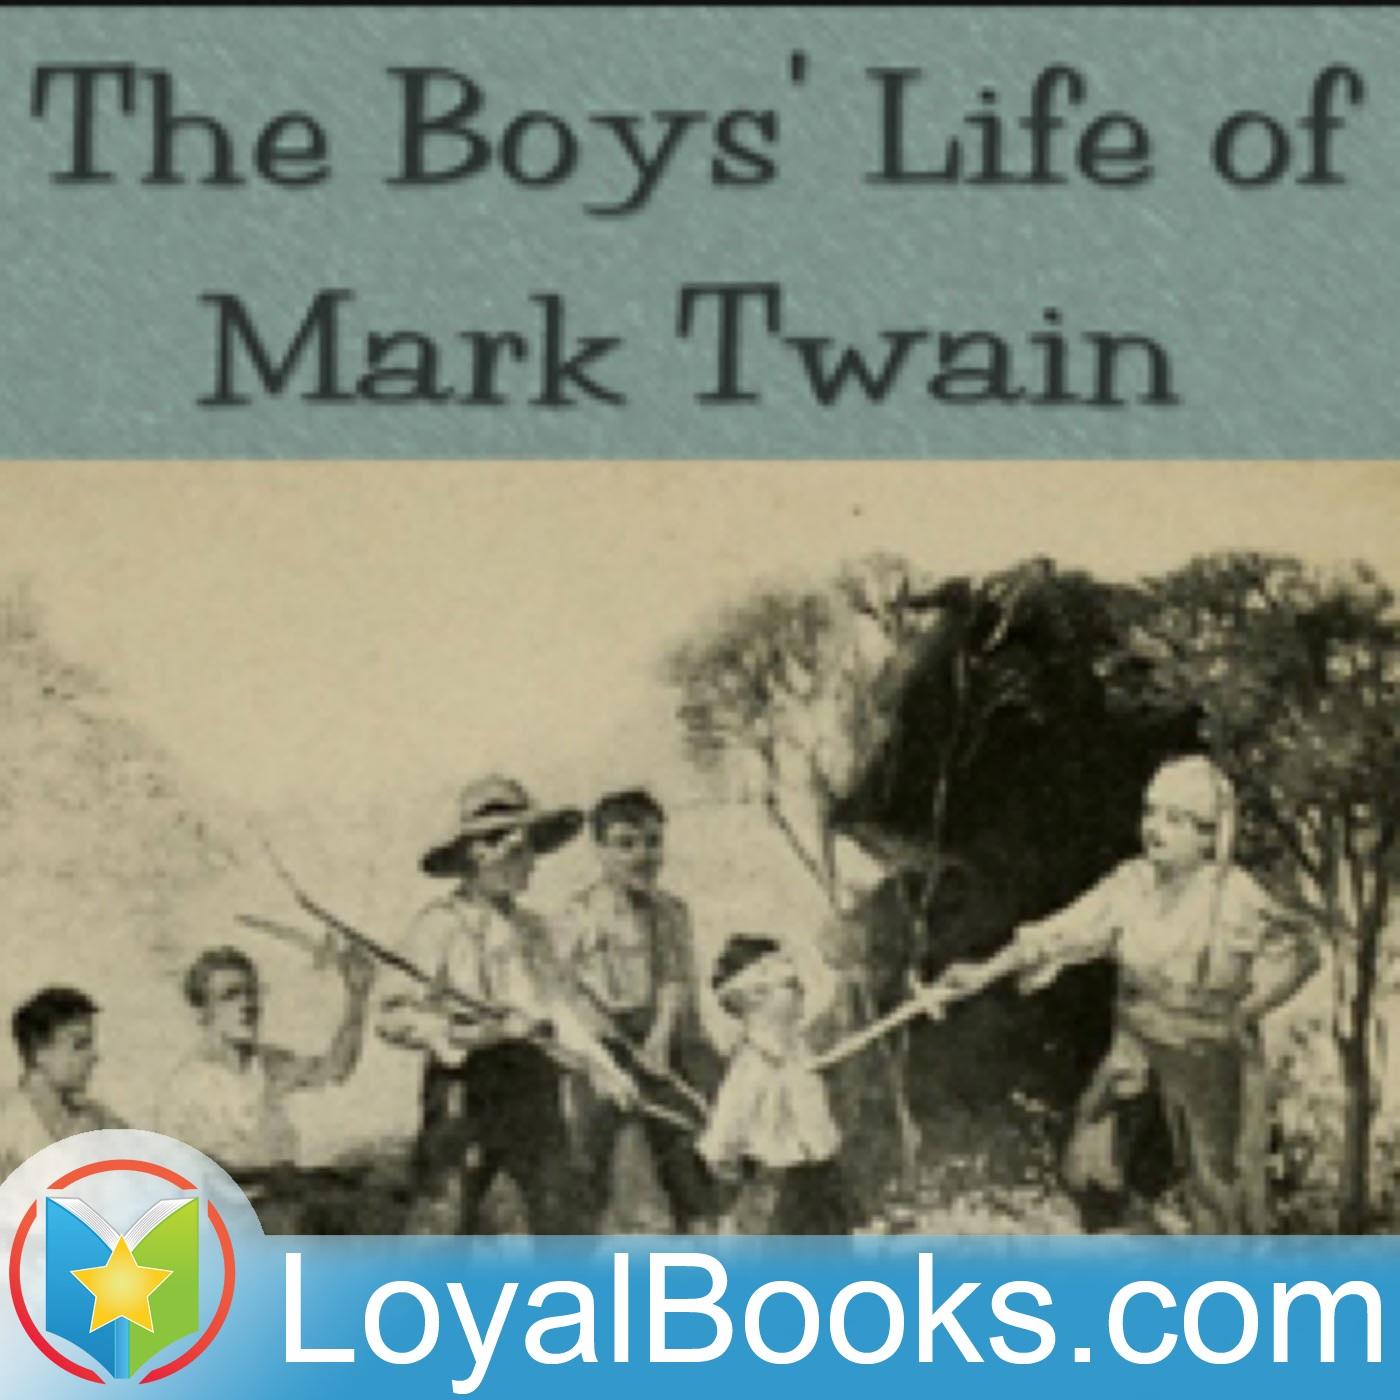 The Boys' Life of Mark Twain by Albert Bigelow Pain  